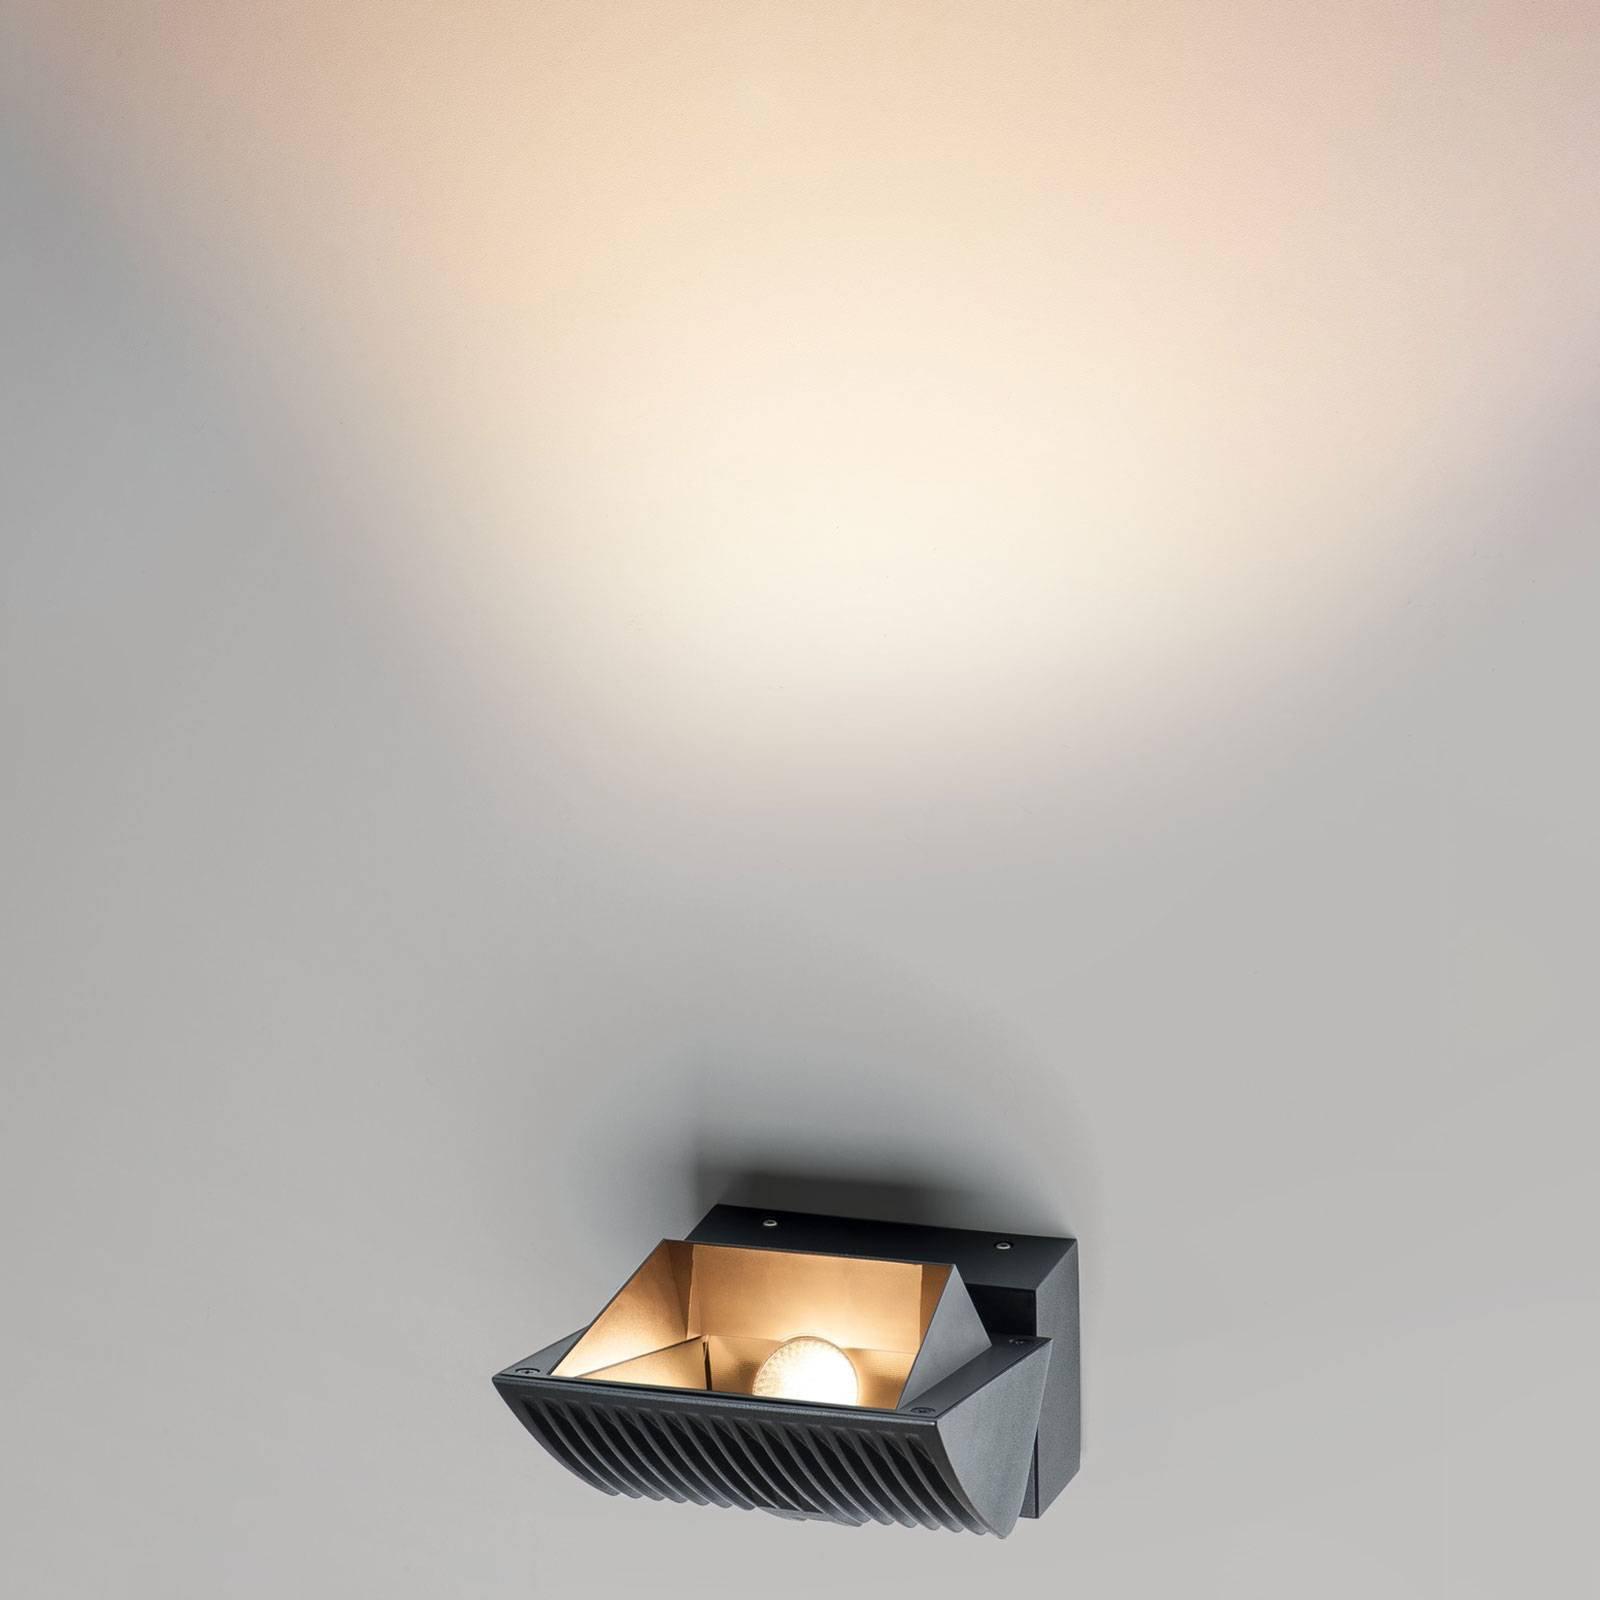 SLV Merado Flood LED-vegglampe, 3 000 K, svart